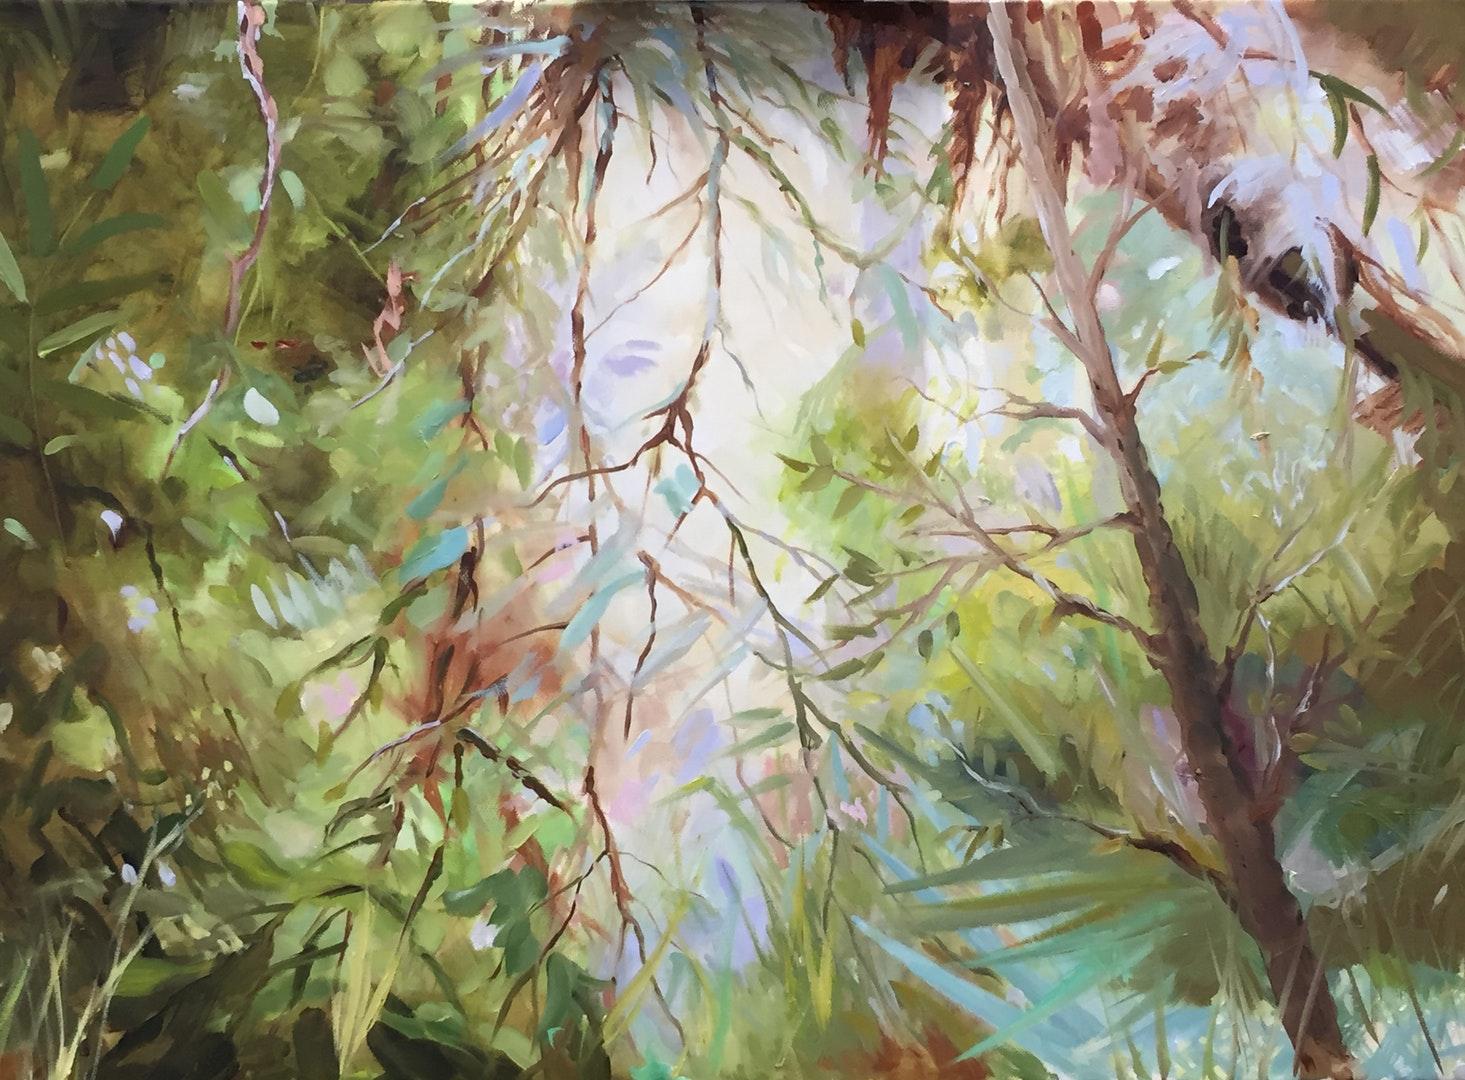 'Tropical Light', Podi Lawrence, Oil on canvas, 51 x 61 cm